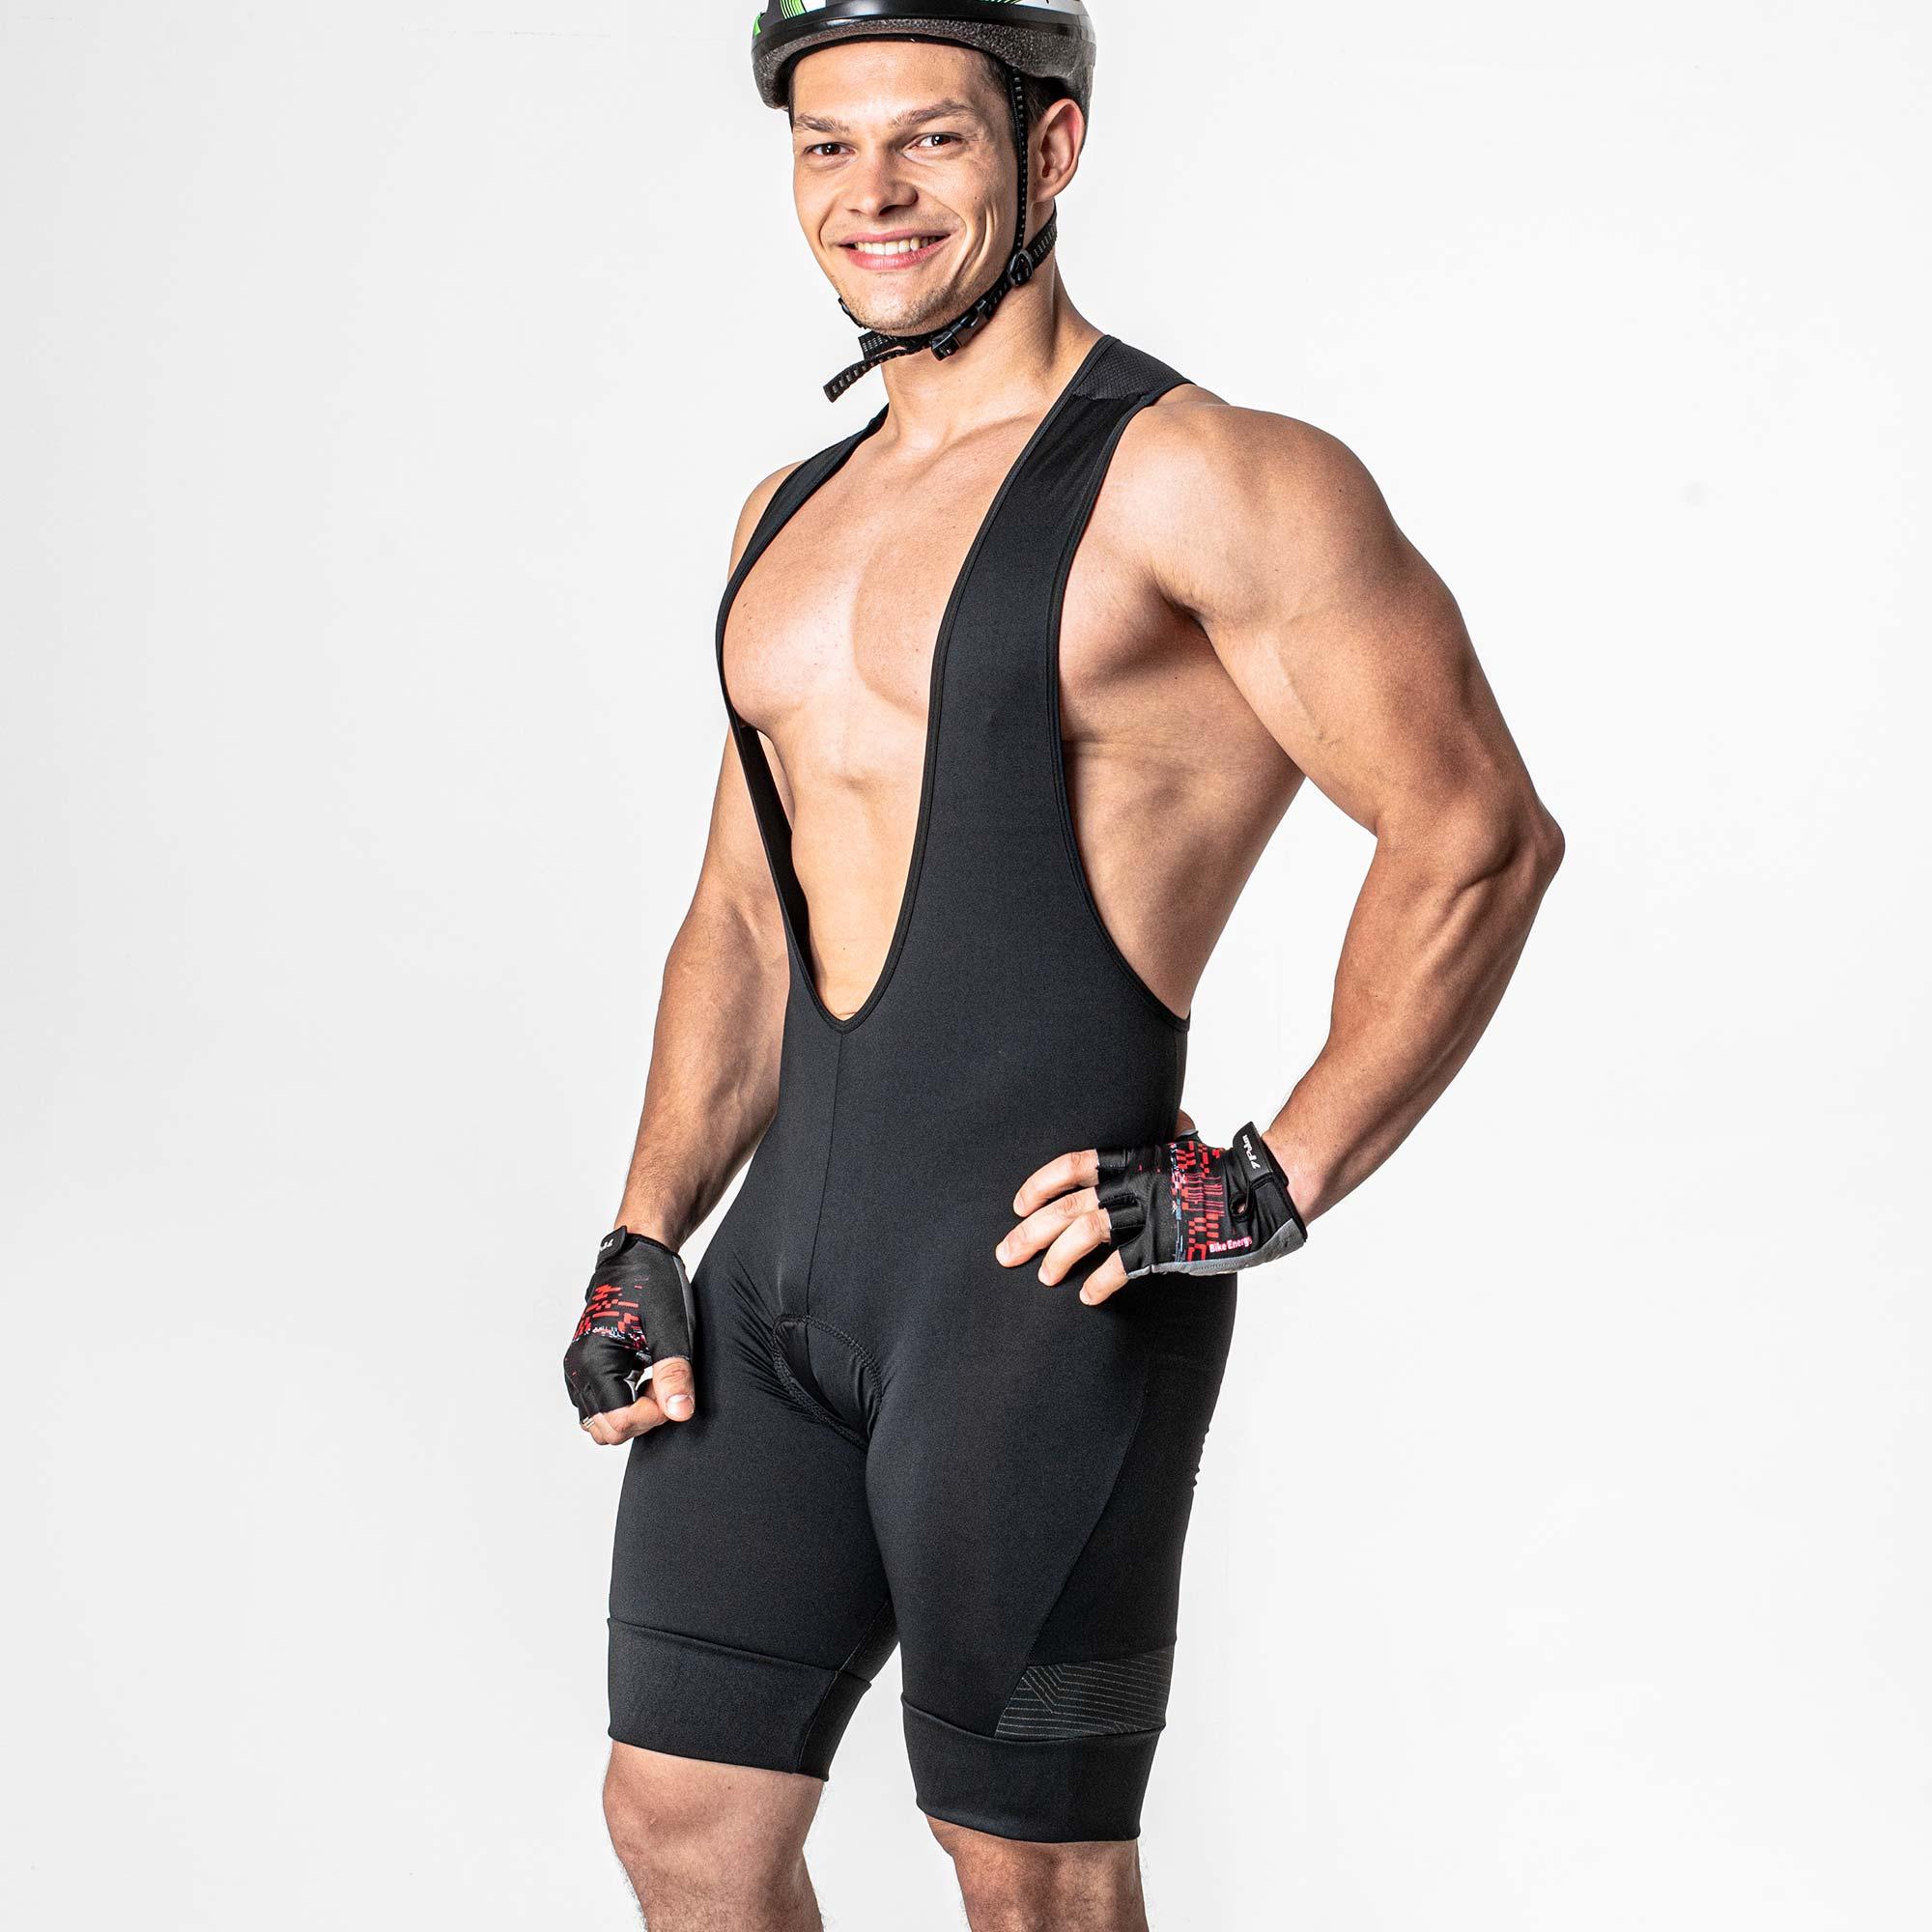 Bretelle Ciclista Roar Com Forro Em Gel 03824